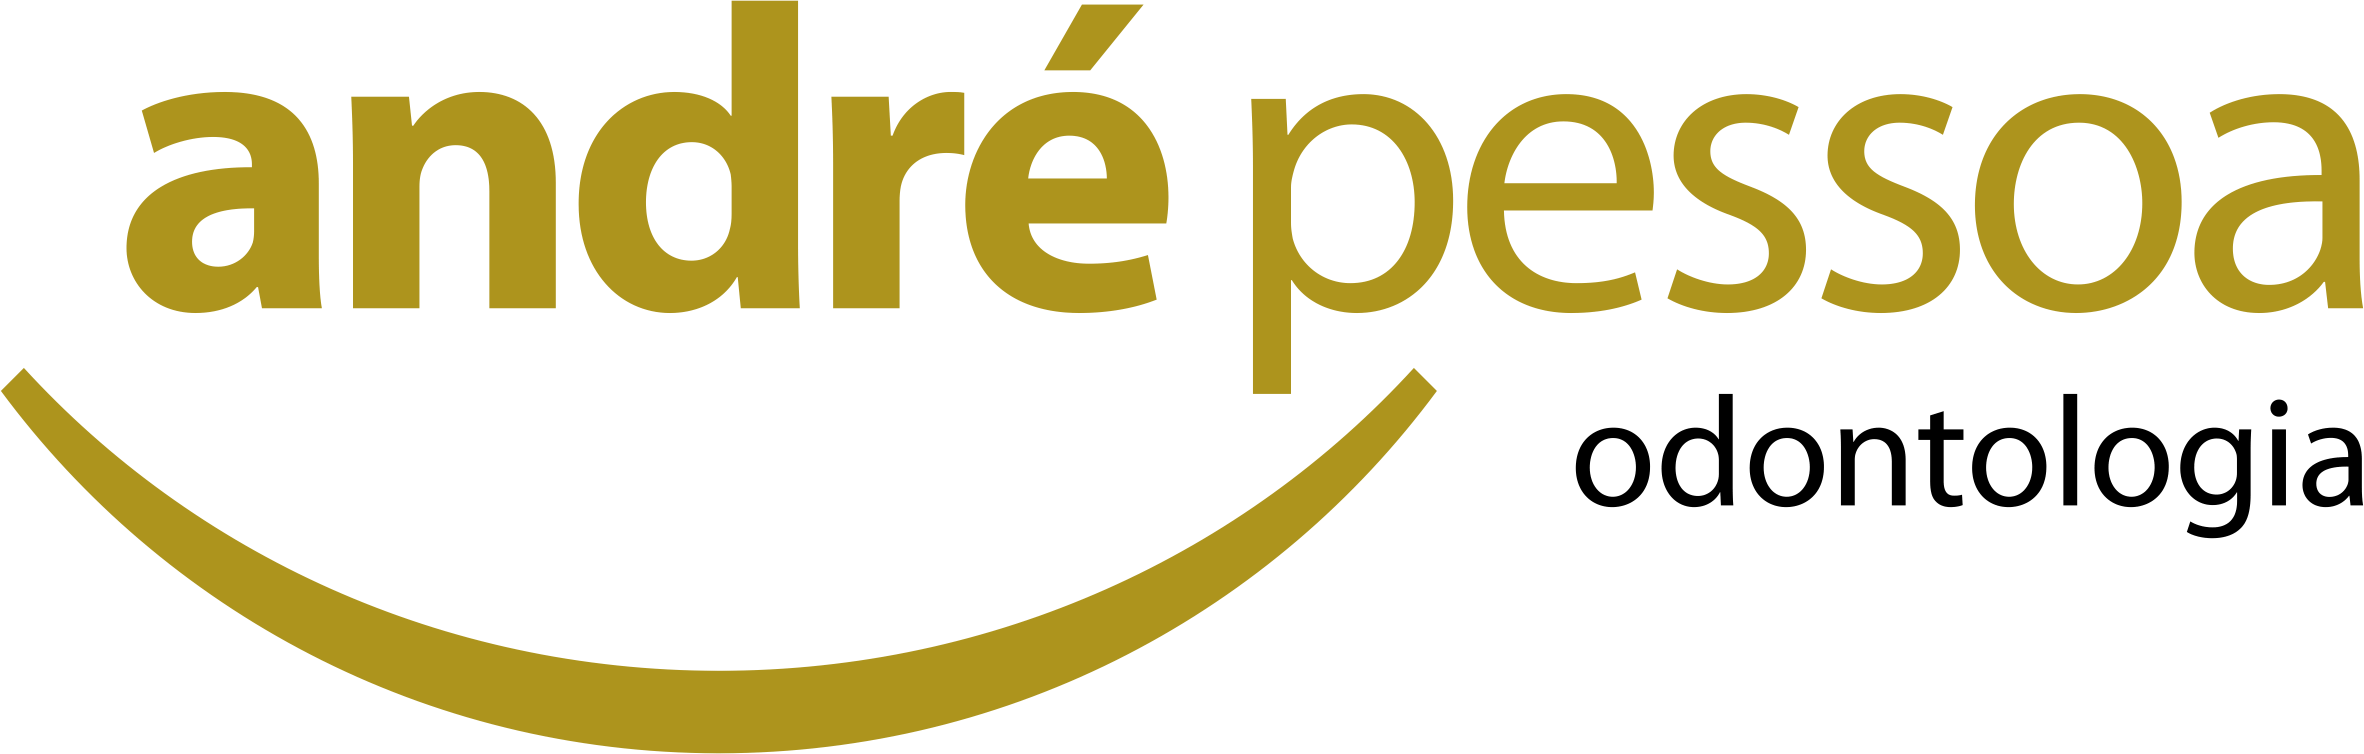 André Bezerra - Logotipo